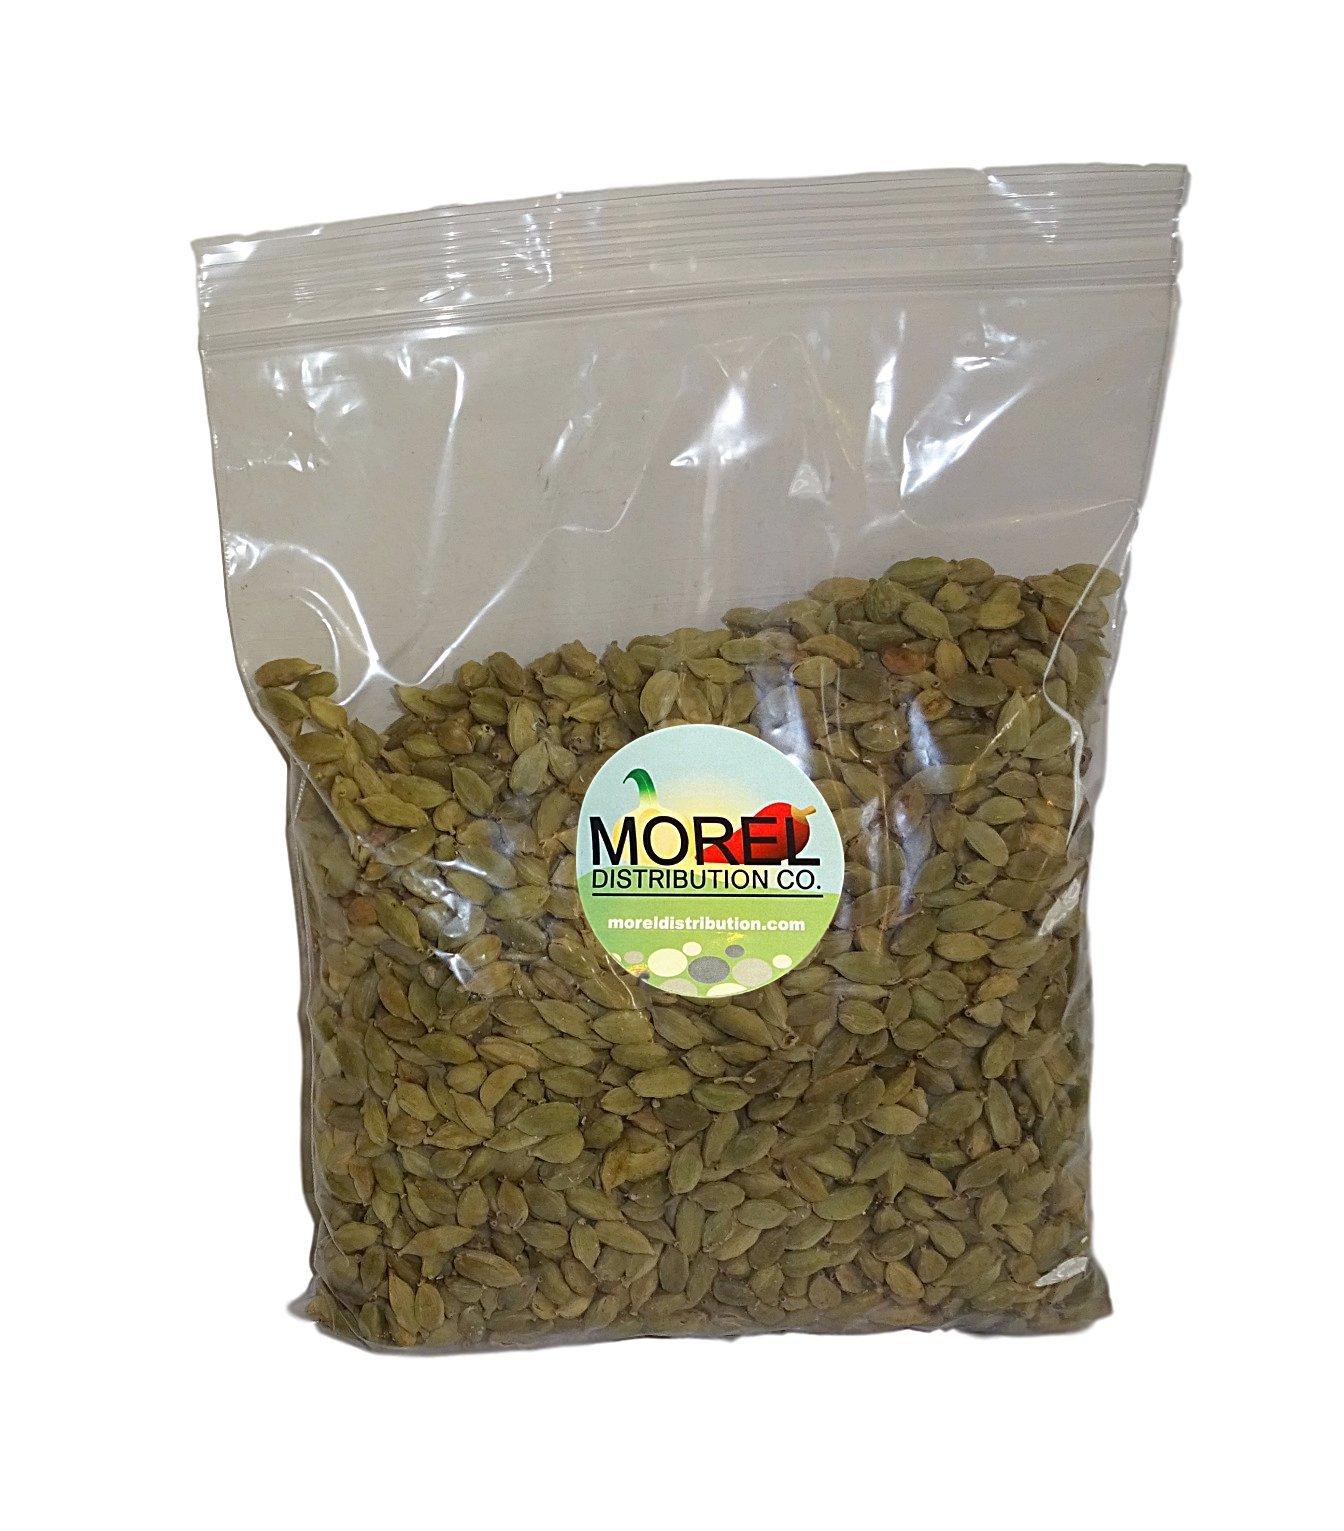 Whole Cardamom Pods/Seeds (Cardamomo) (1 oz, 2 oz, 4 oz, 6 oz, 8 oz, 12 oz, 1 lb, 2 lbs) (1 LB) by Morel Distribution Company (Image #2)